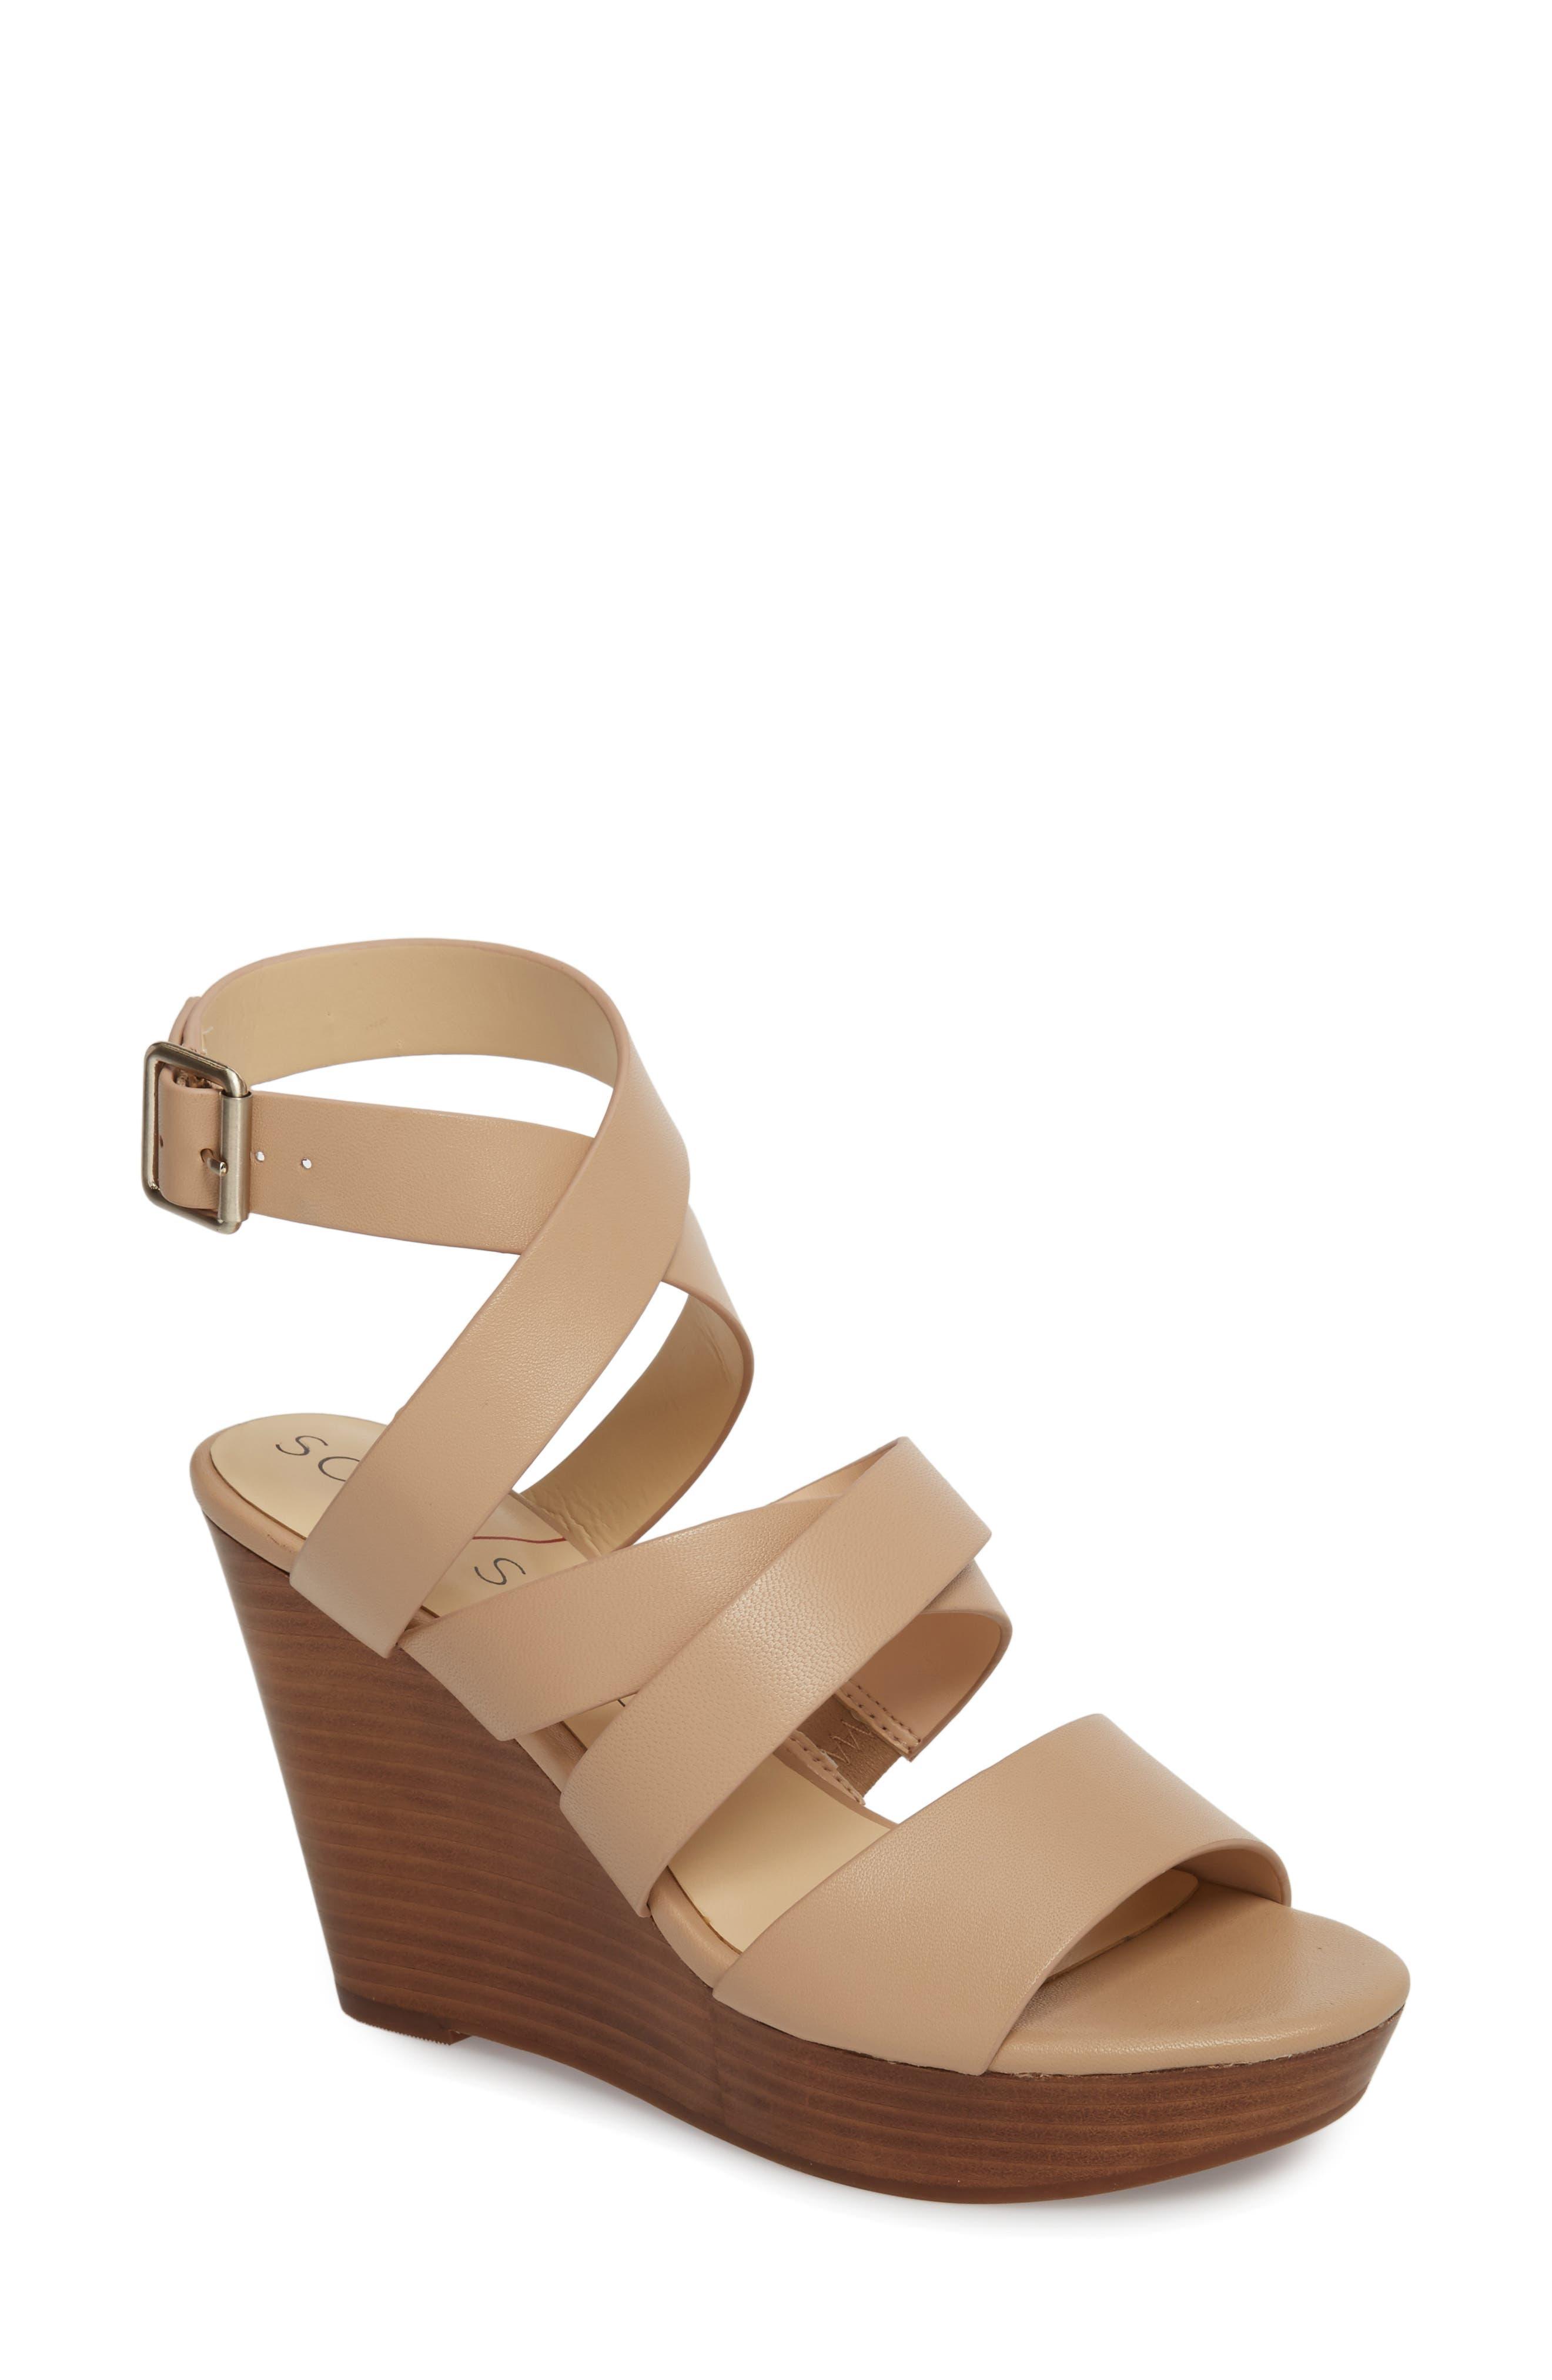 SOLE SOCIETY Pippy Platform Sandal, Main, color, TAN